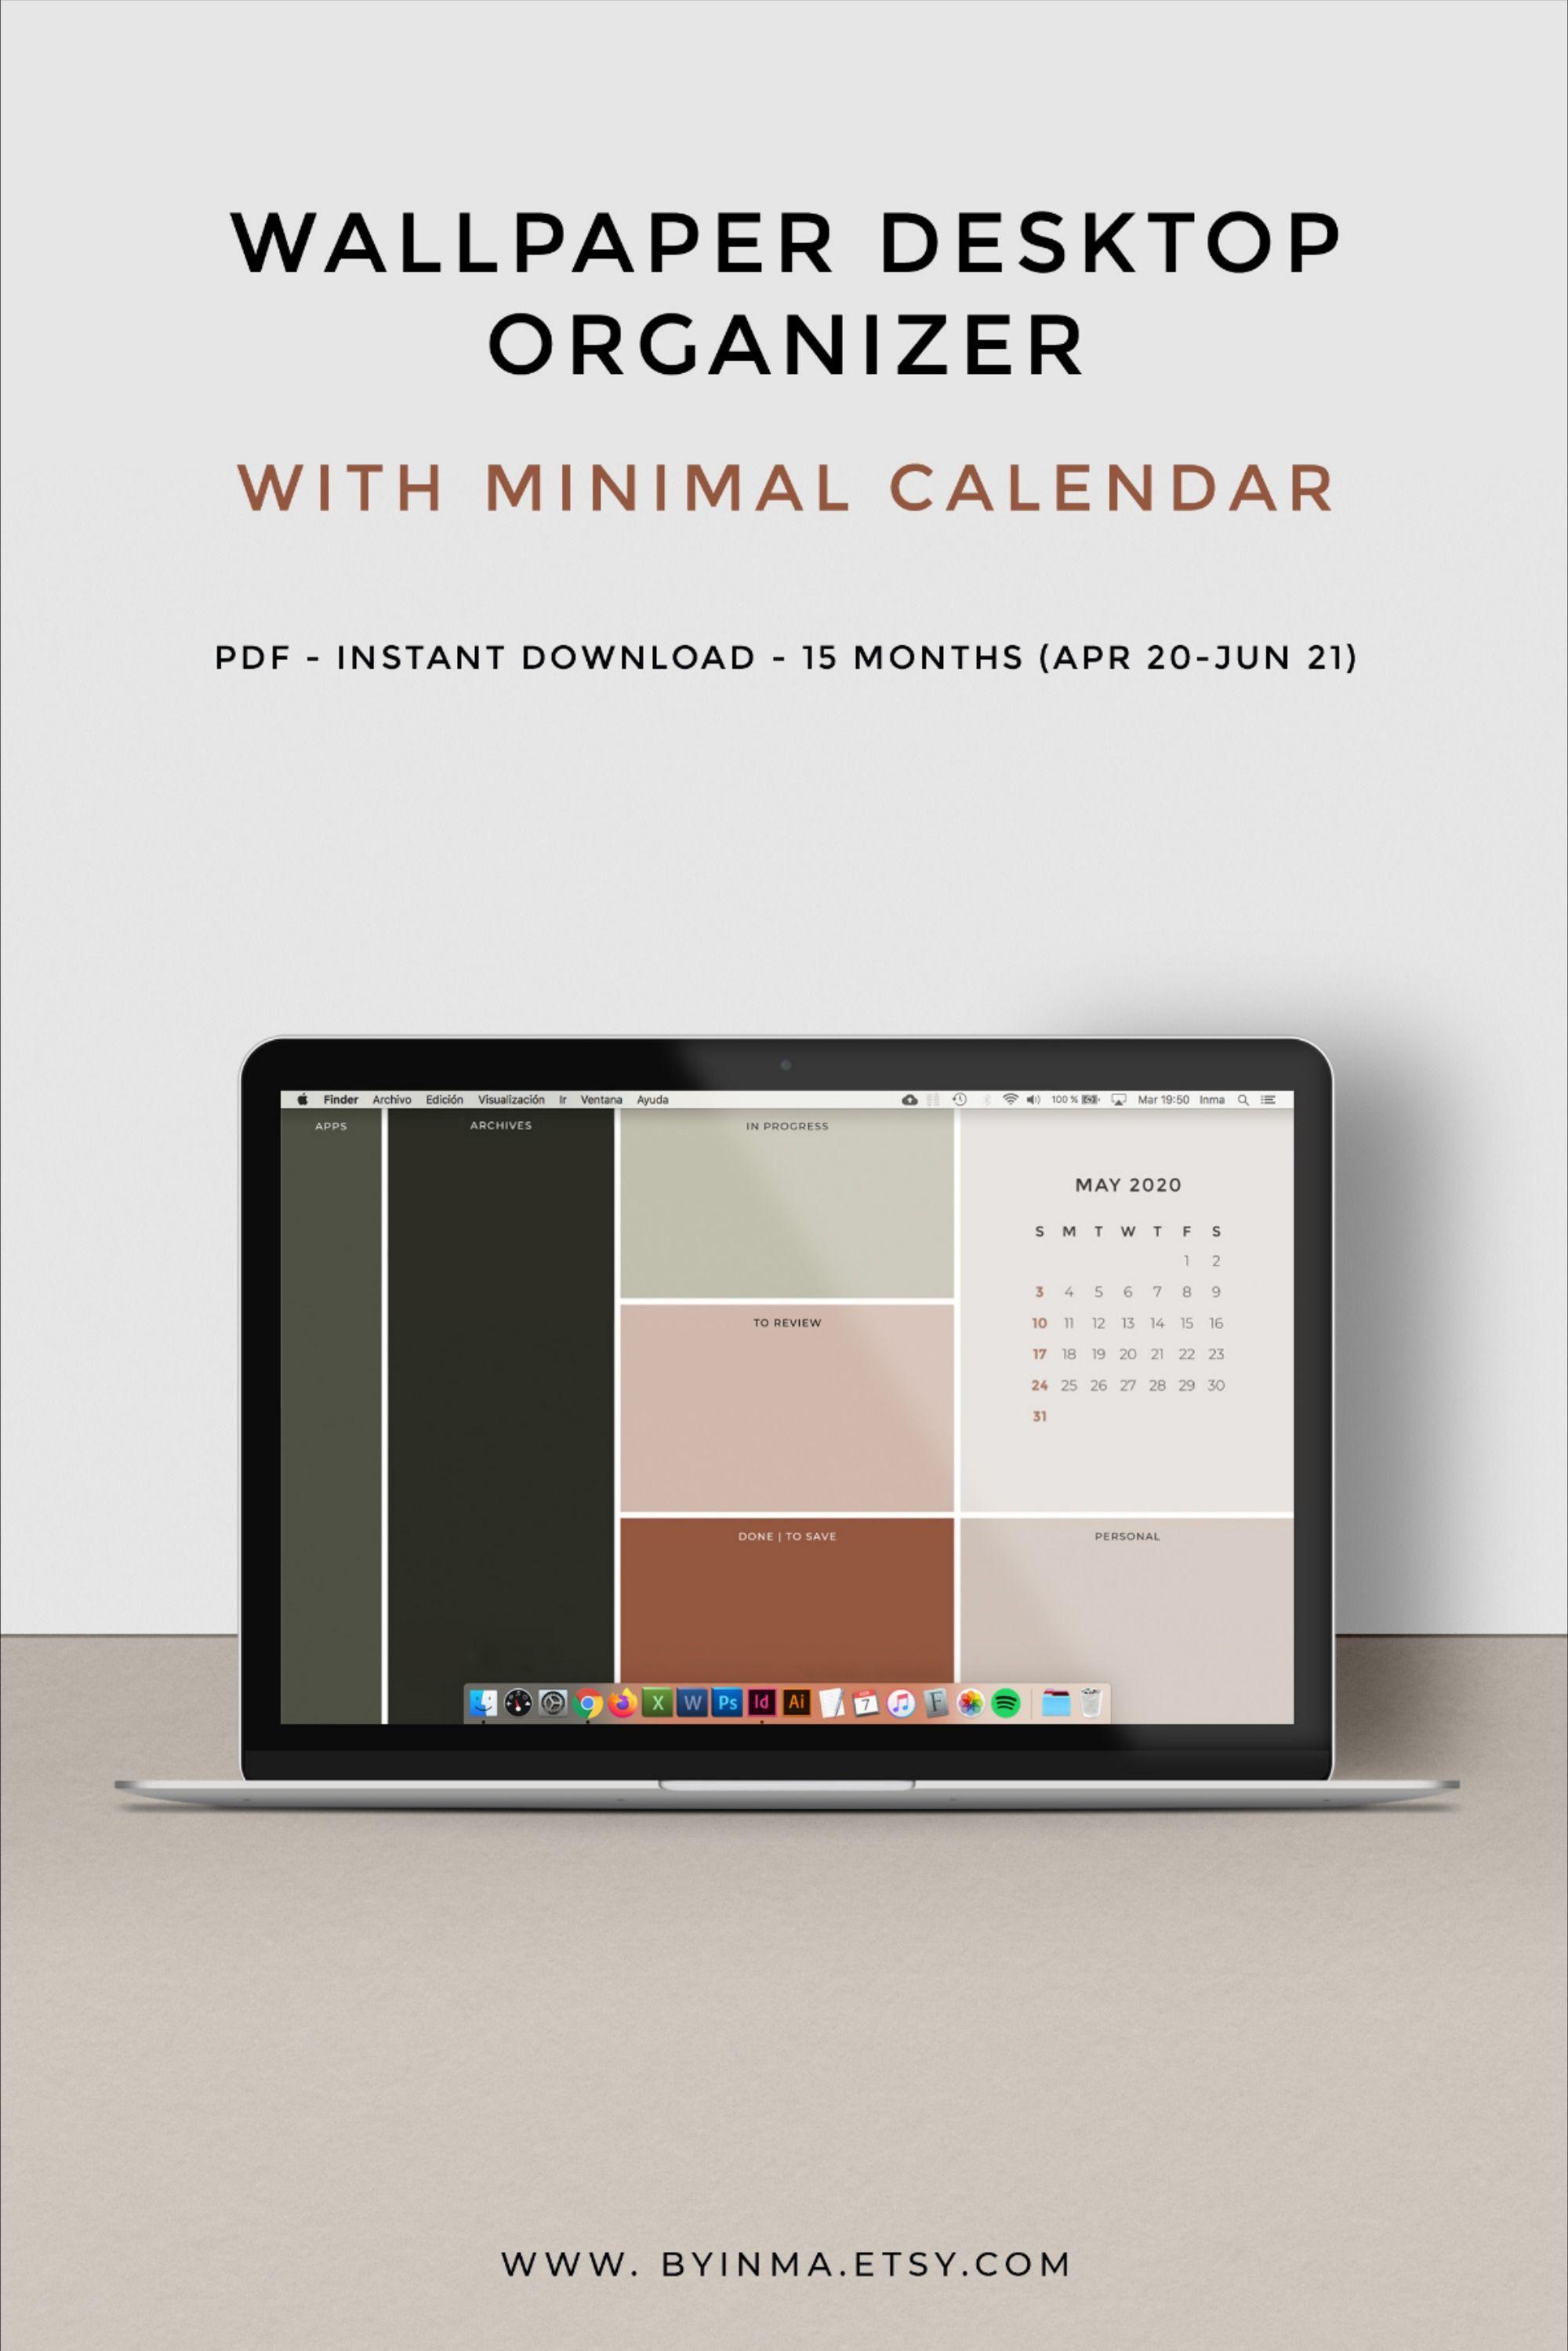 Desktop Wallpaper Organizer With 2021 2022 Calendar Minimalist Desktop Background Digital Download 16 9 Ratio And 16 10 Ratio Desktop Wallpaper Organizer Desktop Organization Desktop